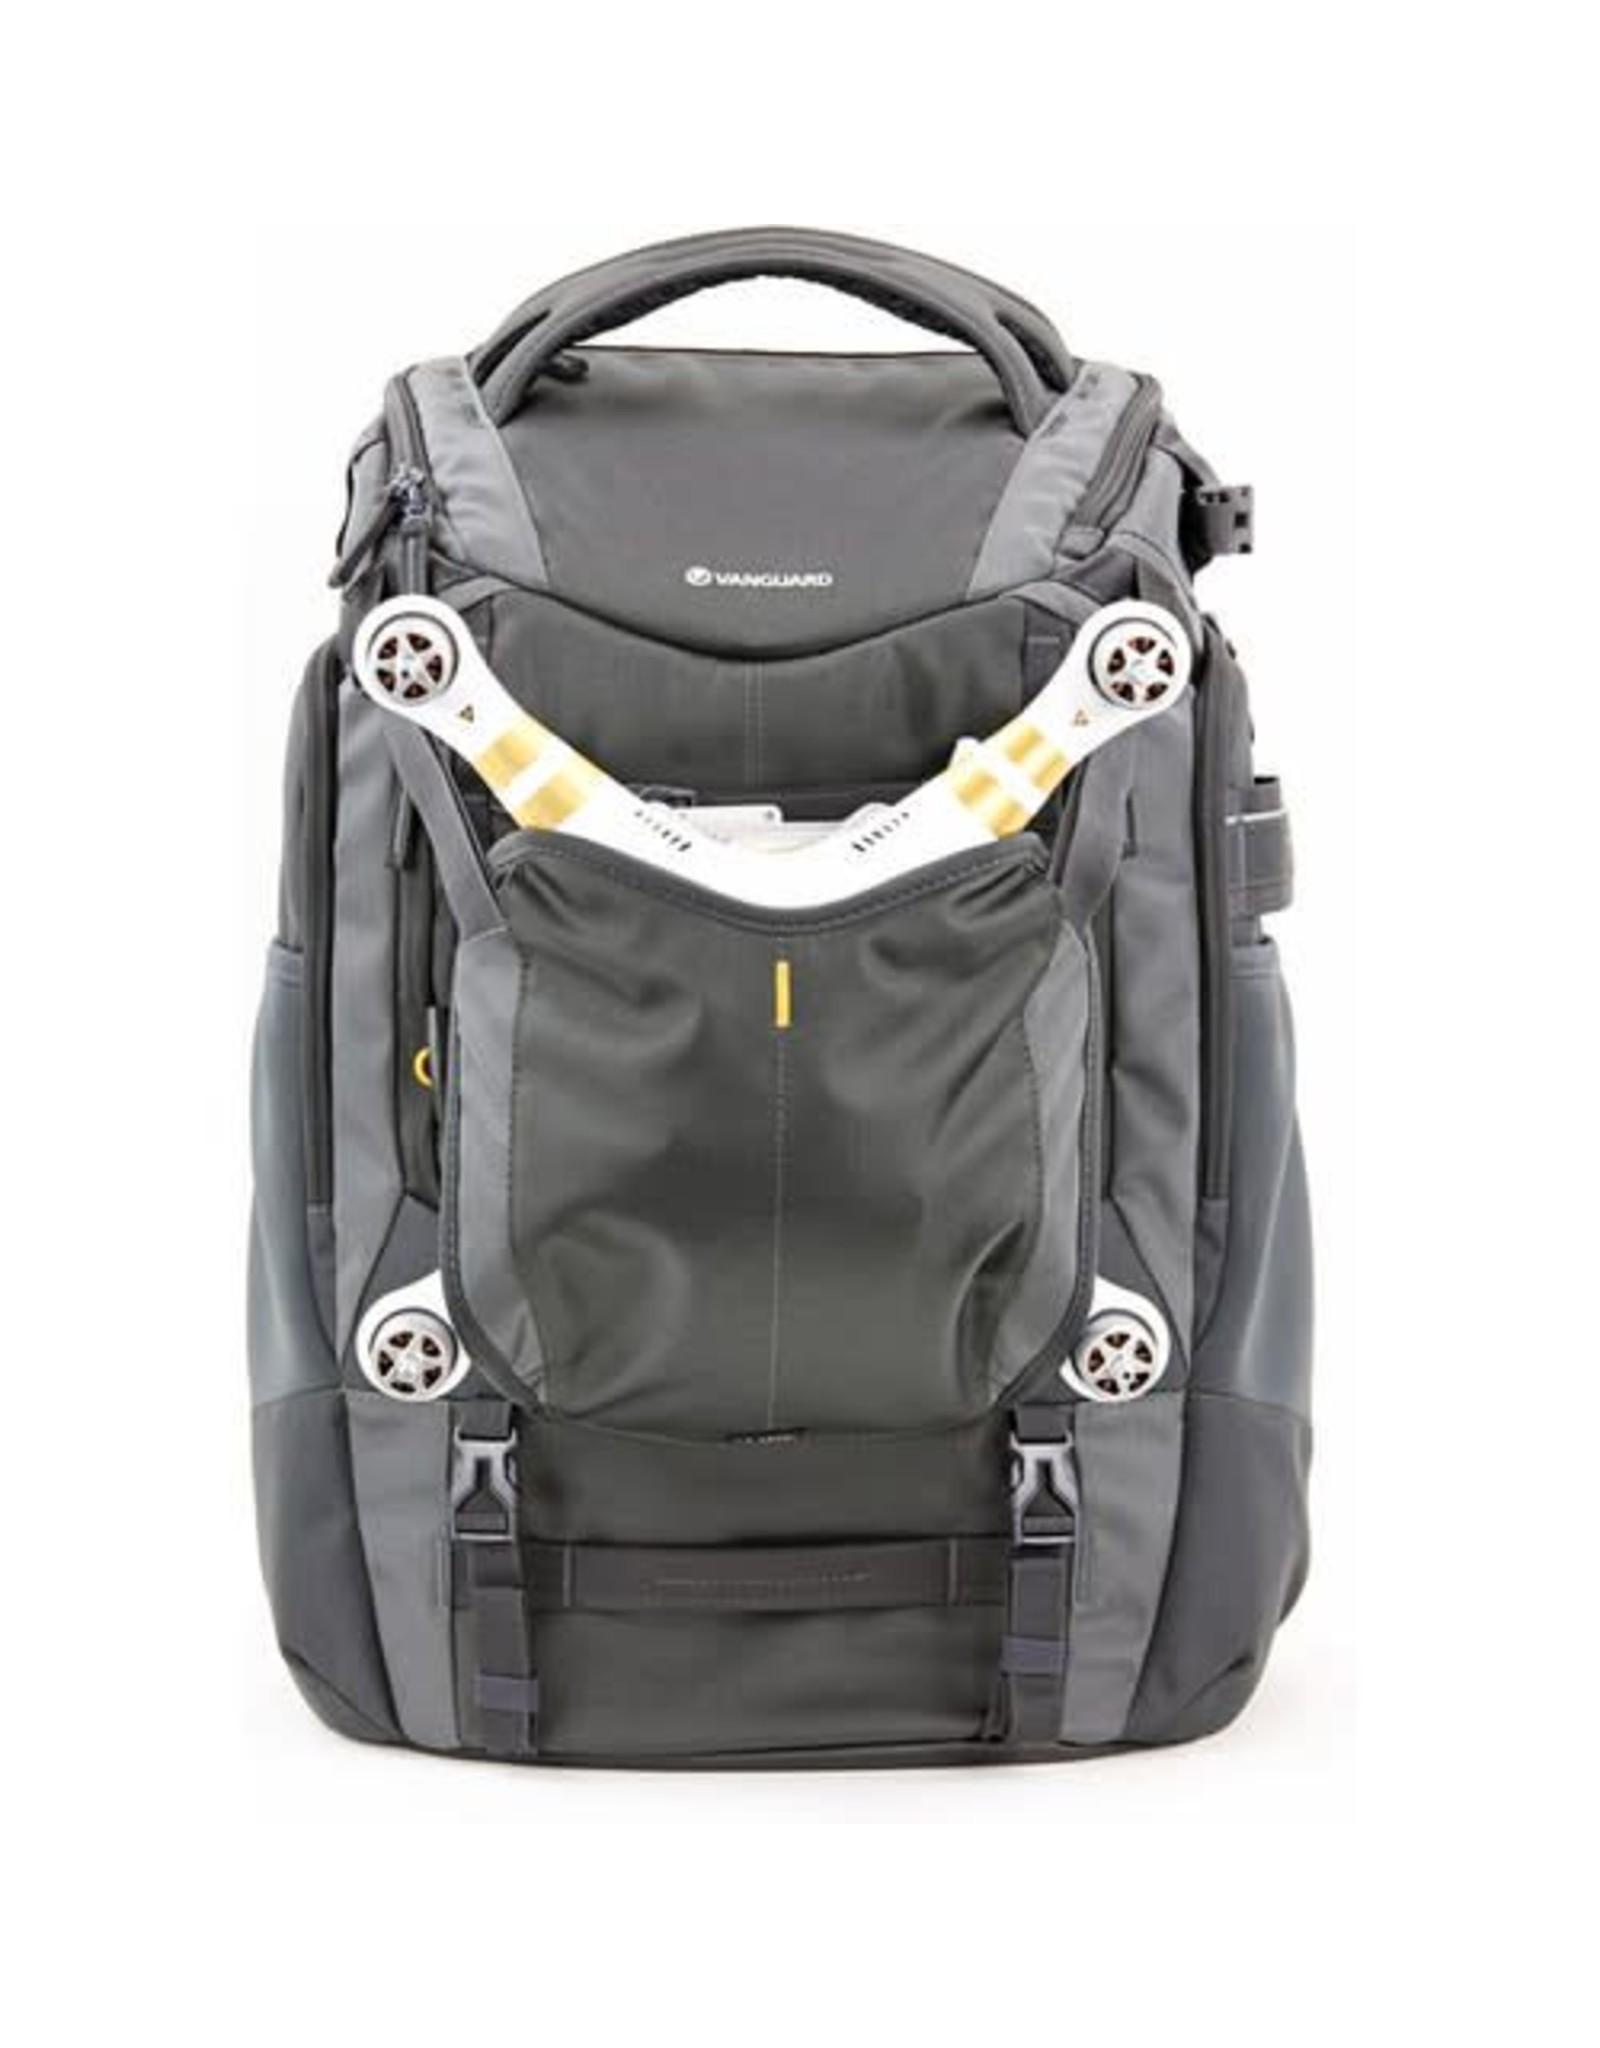 Vanguard Vanguard Alta Sky 53 Backpack